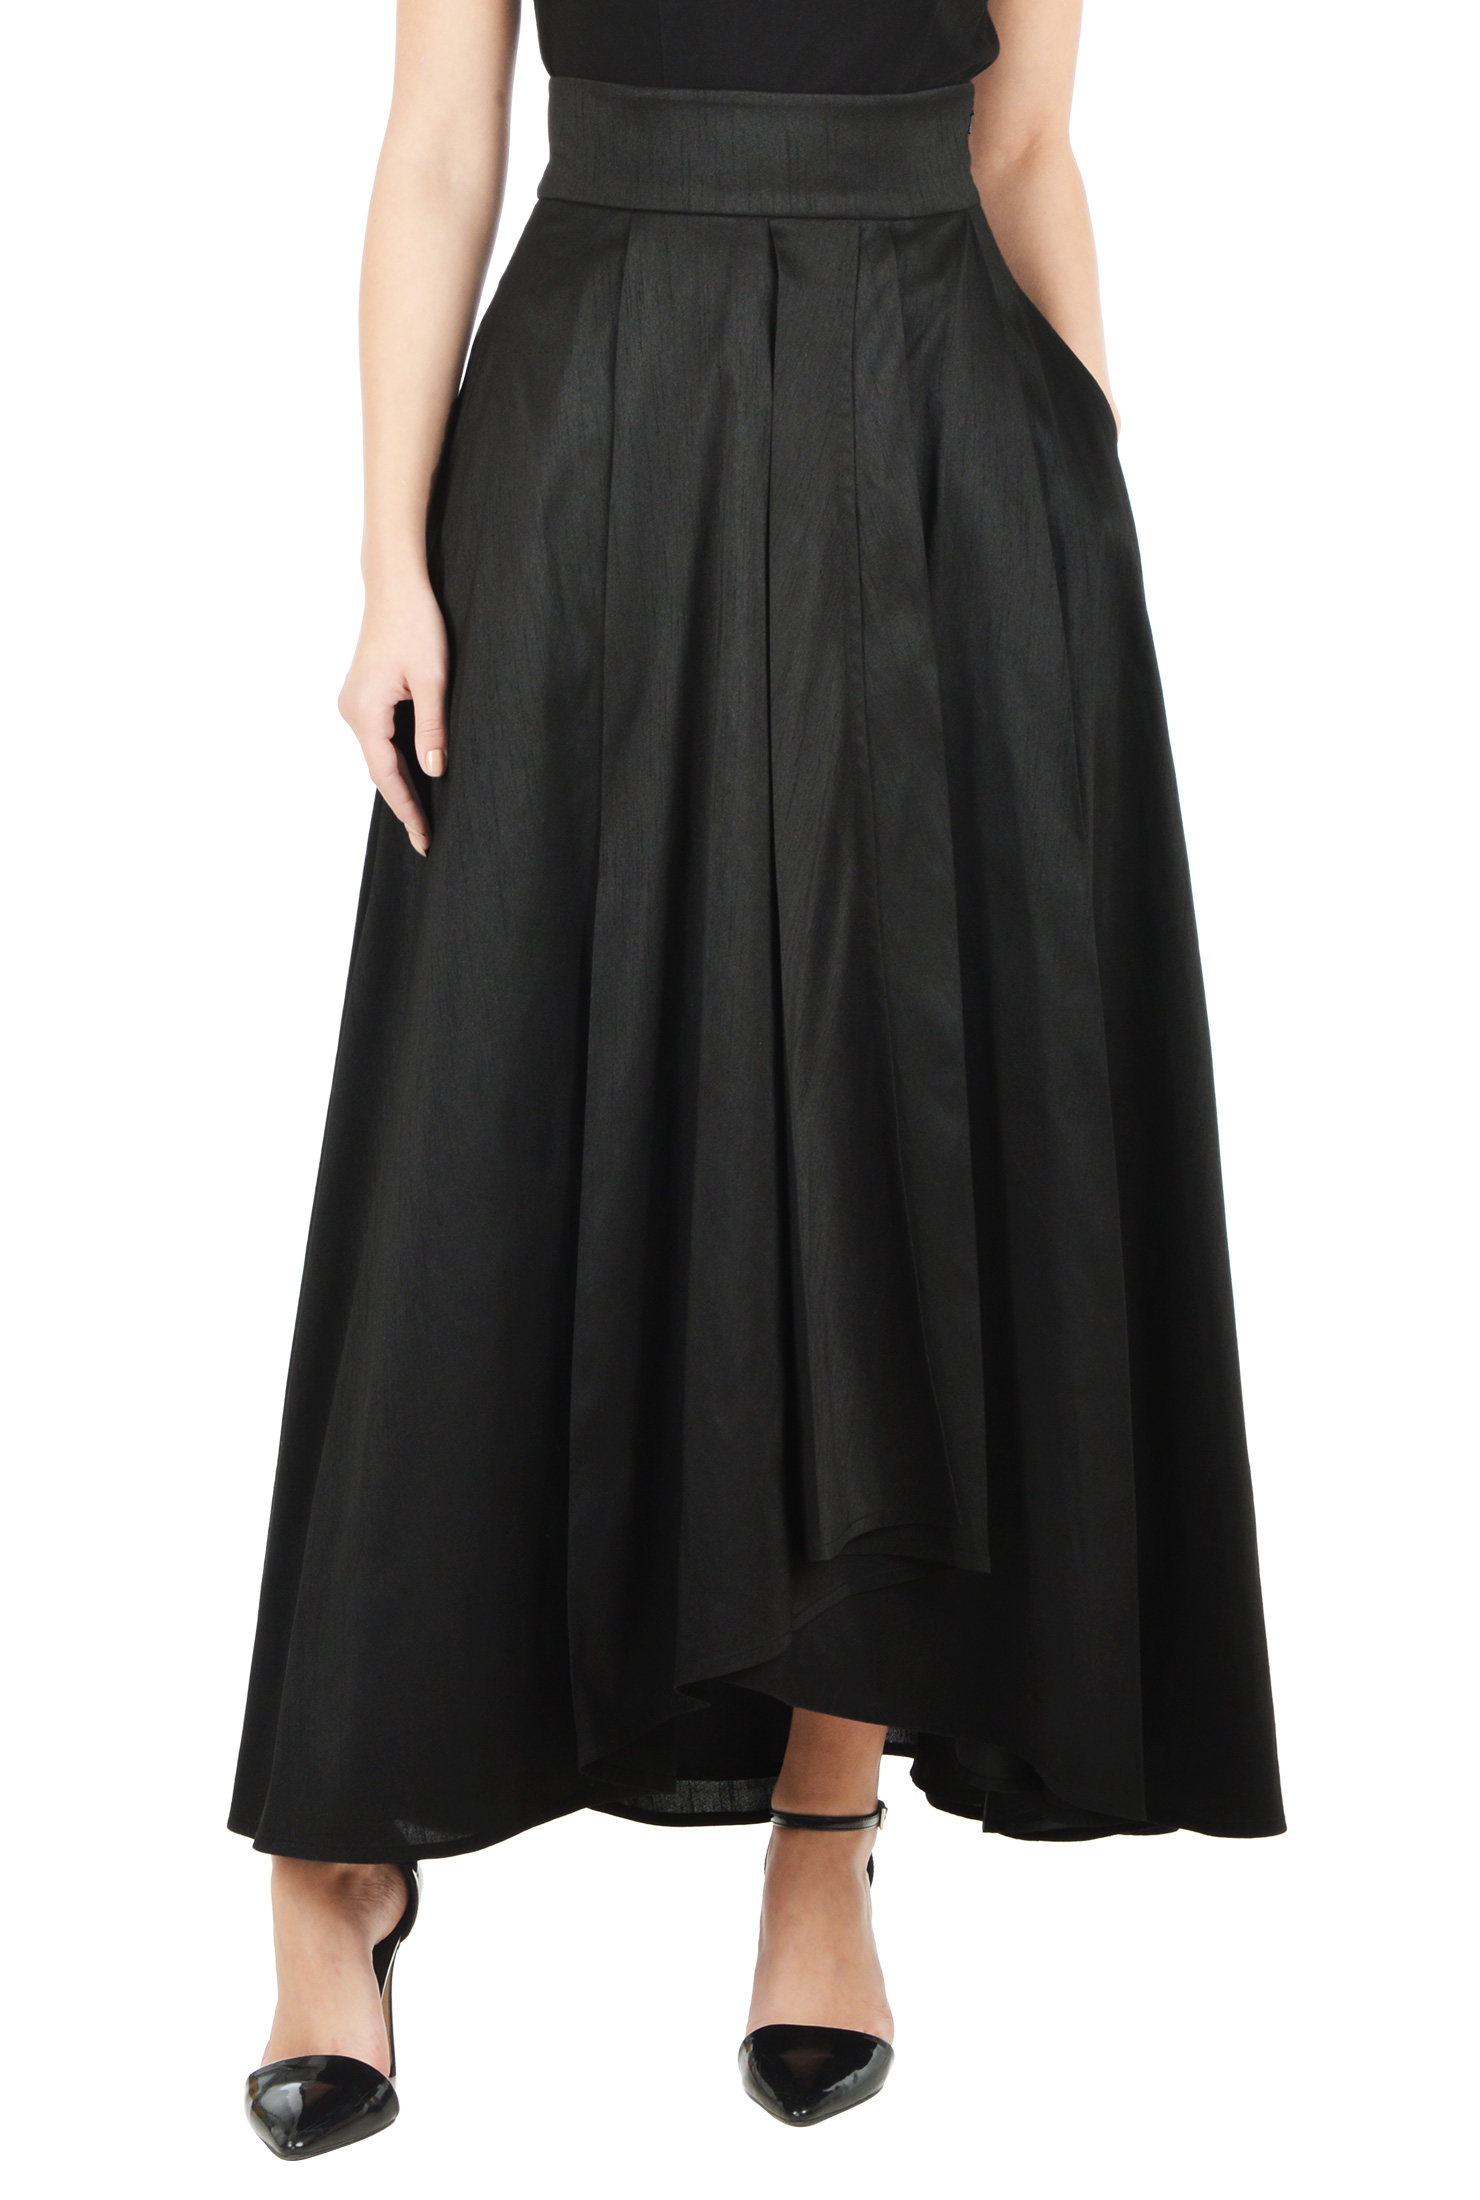 eShakti Women's Faux wrap dupion maxi skirt